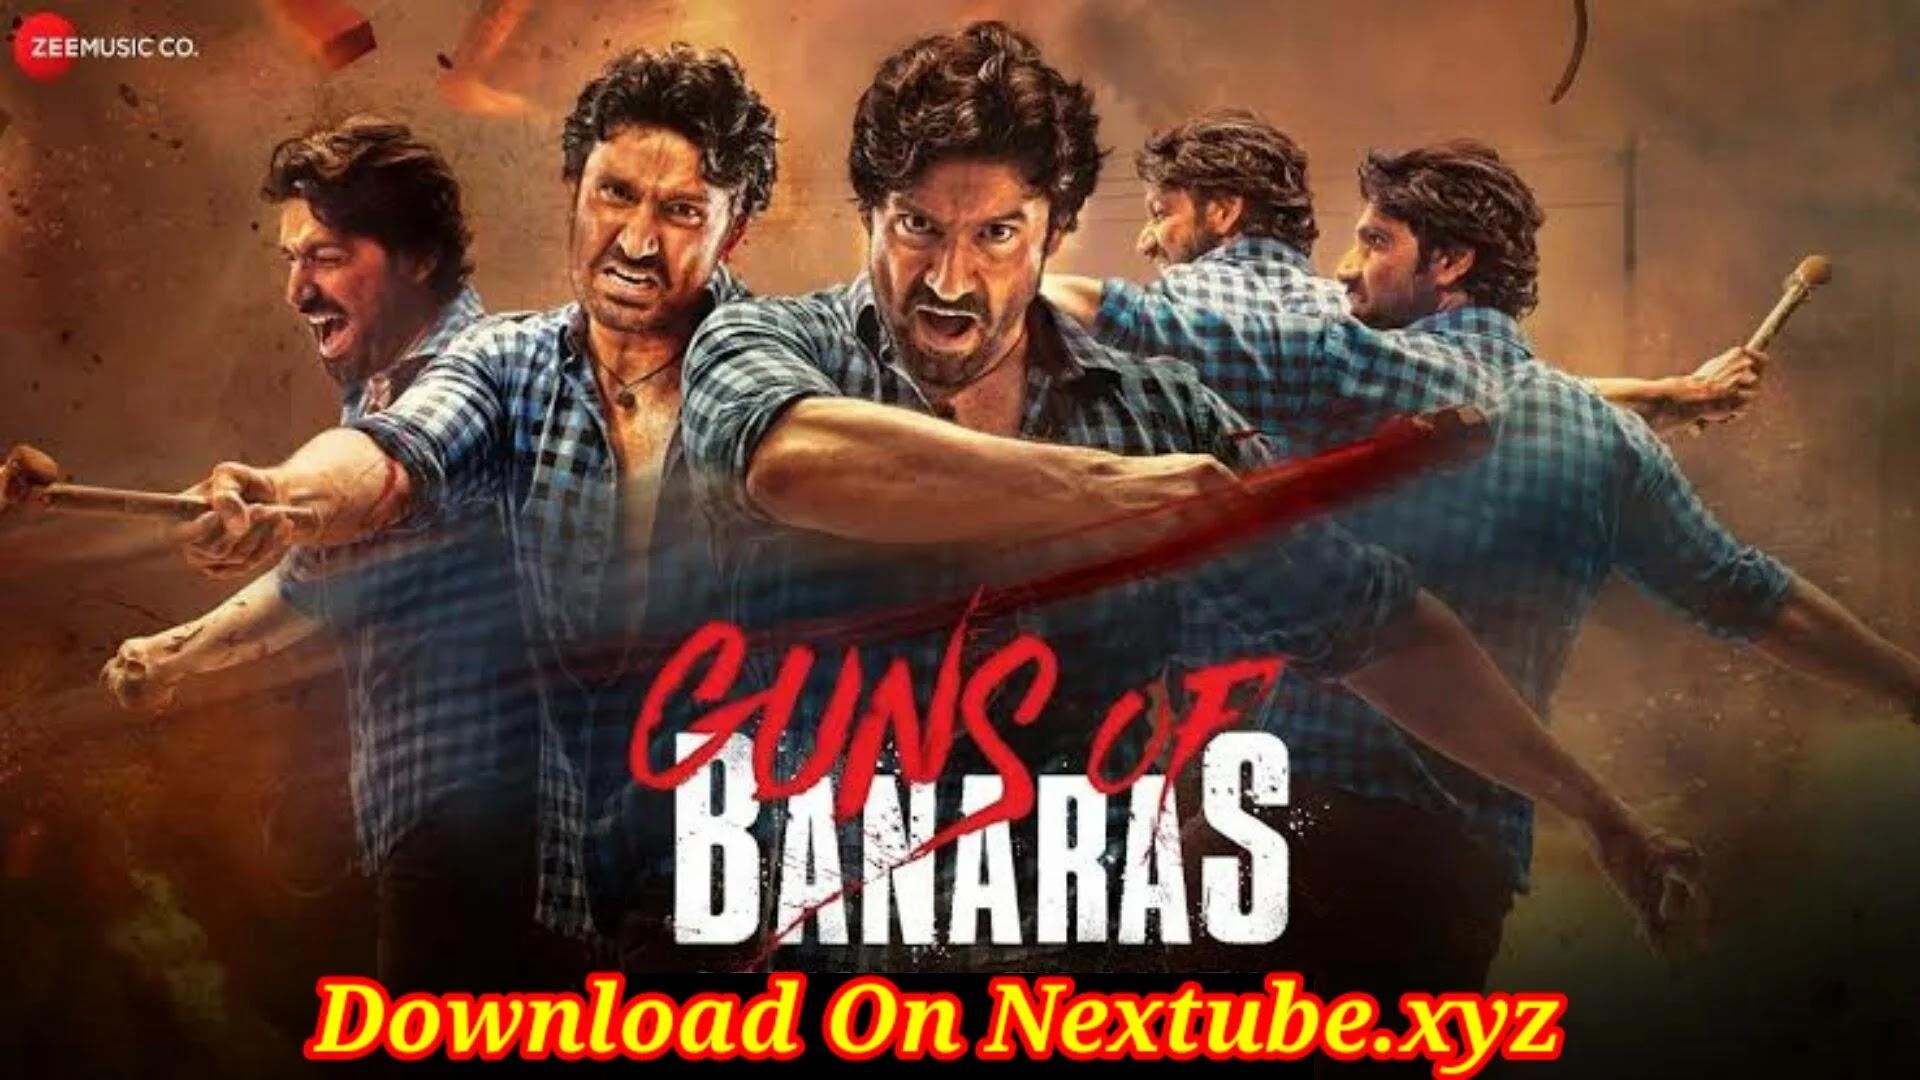 Guns of Banaras Full movie download 480p Filmyzilla